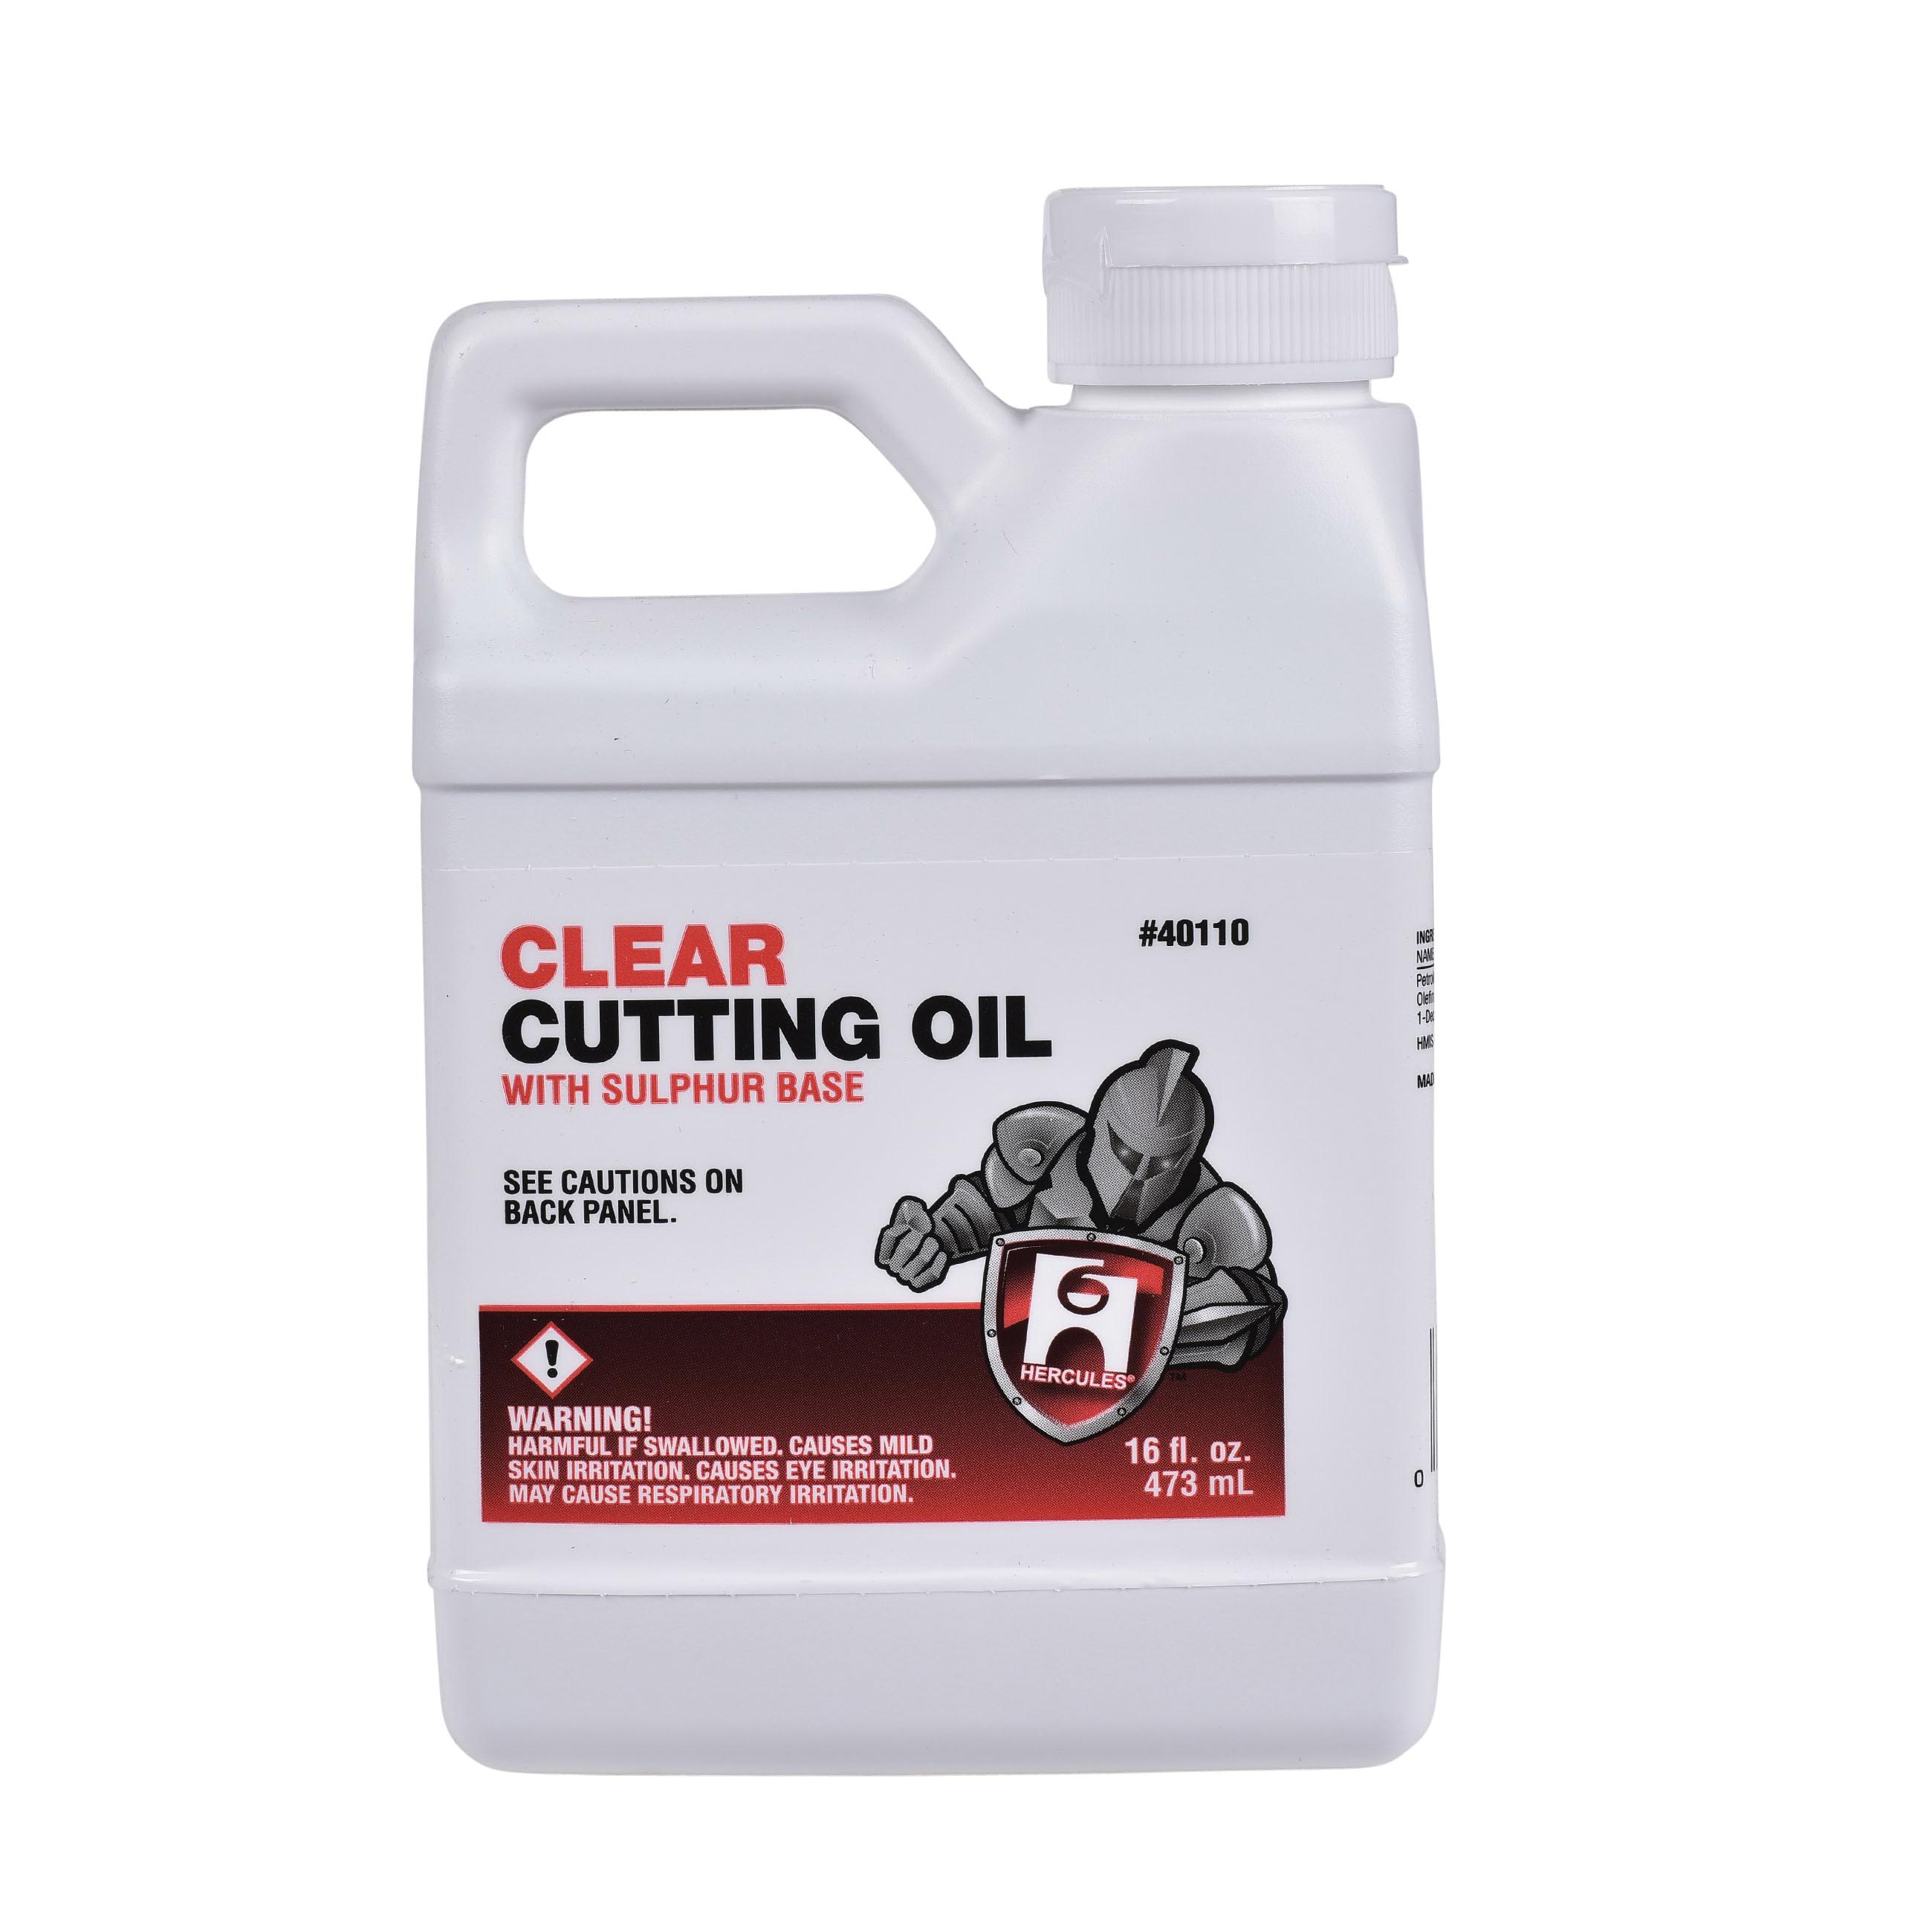 Hercules® 40110 Cutting Oil, 1 pt, Liquid, Dark Amber, Slight Hydrocarbon